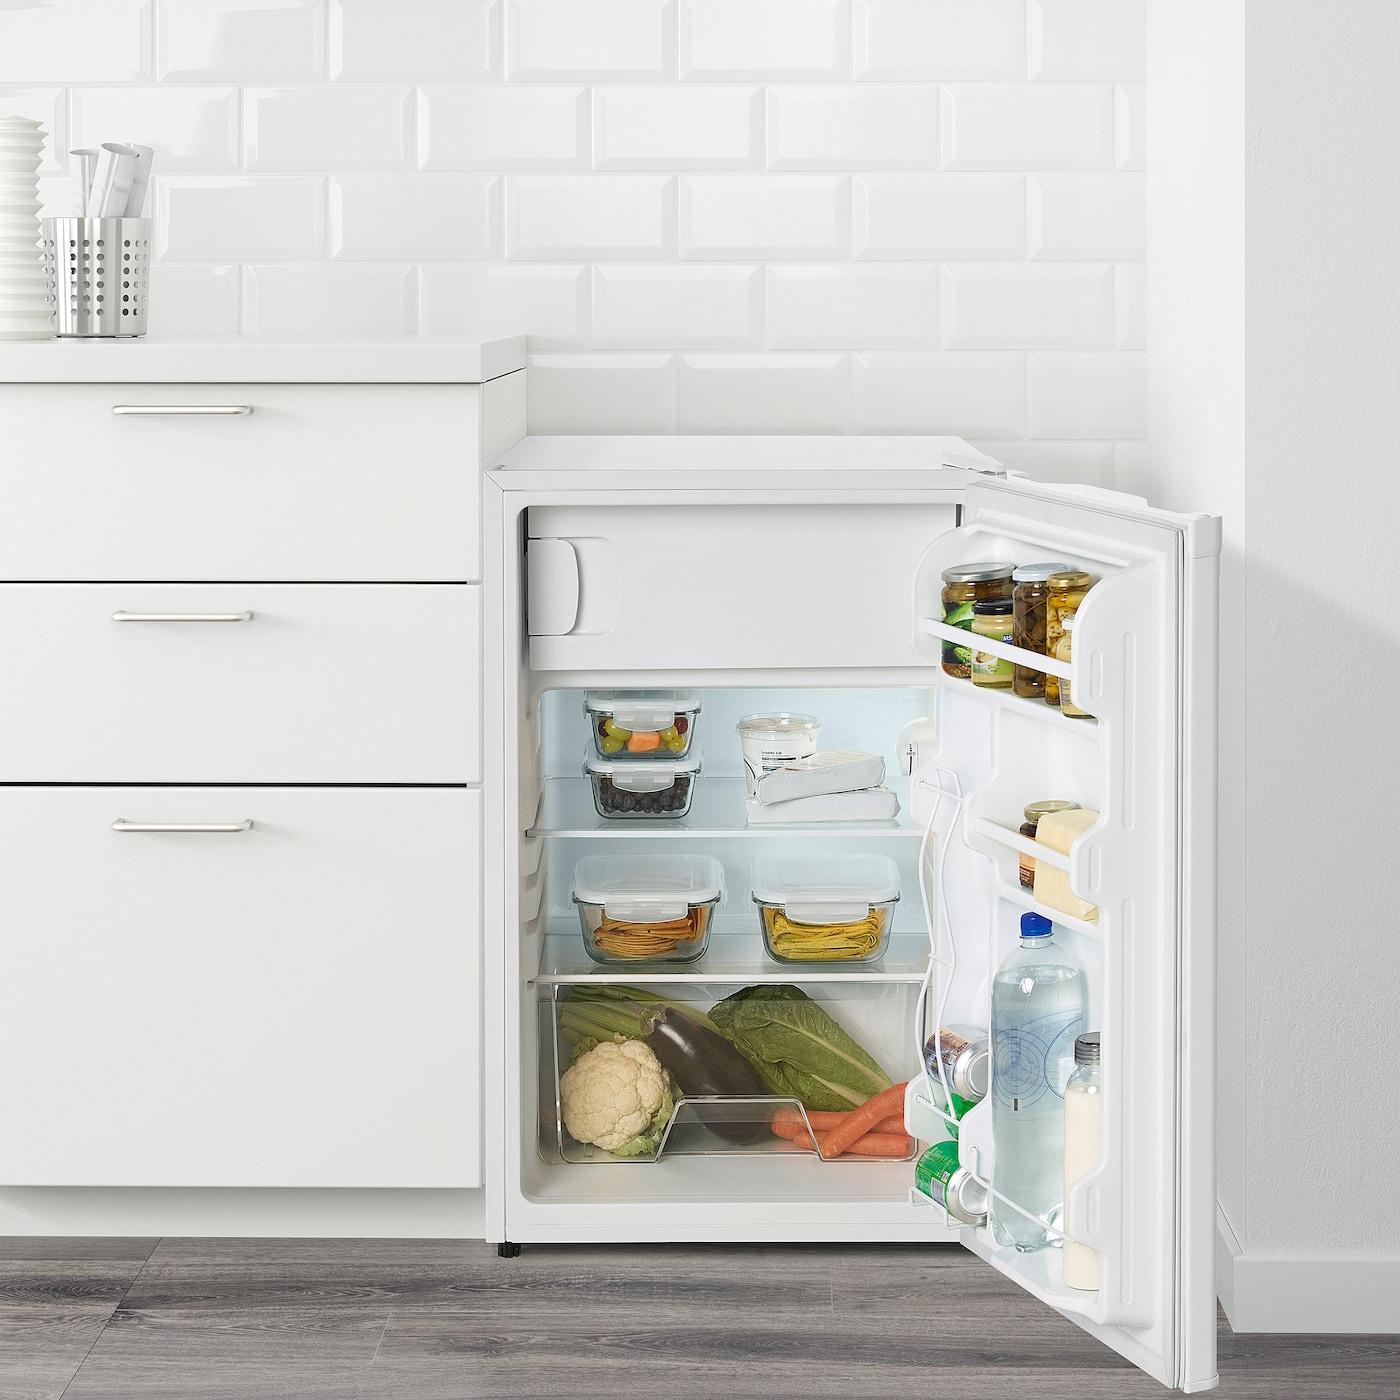 Lagan Fridge With Freezer Compartment Ikea